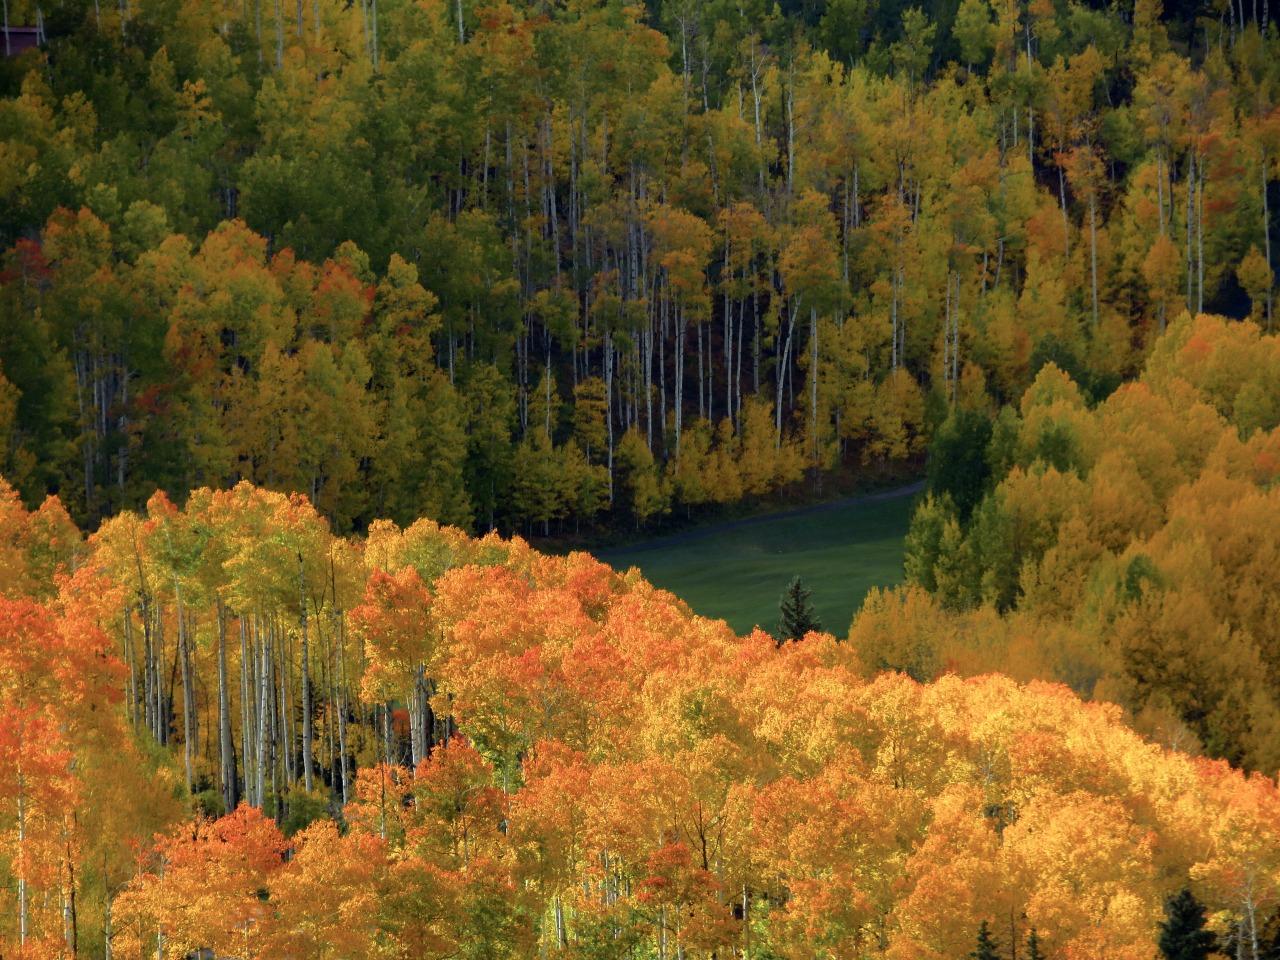 Telluride Autumn #my photos#original photography #photographers on tumblr #imiging#fall colors#telluride#colorado#aspens